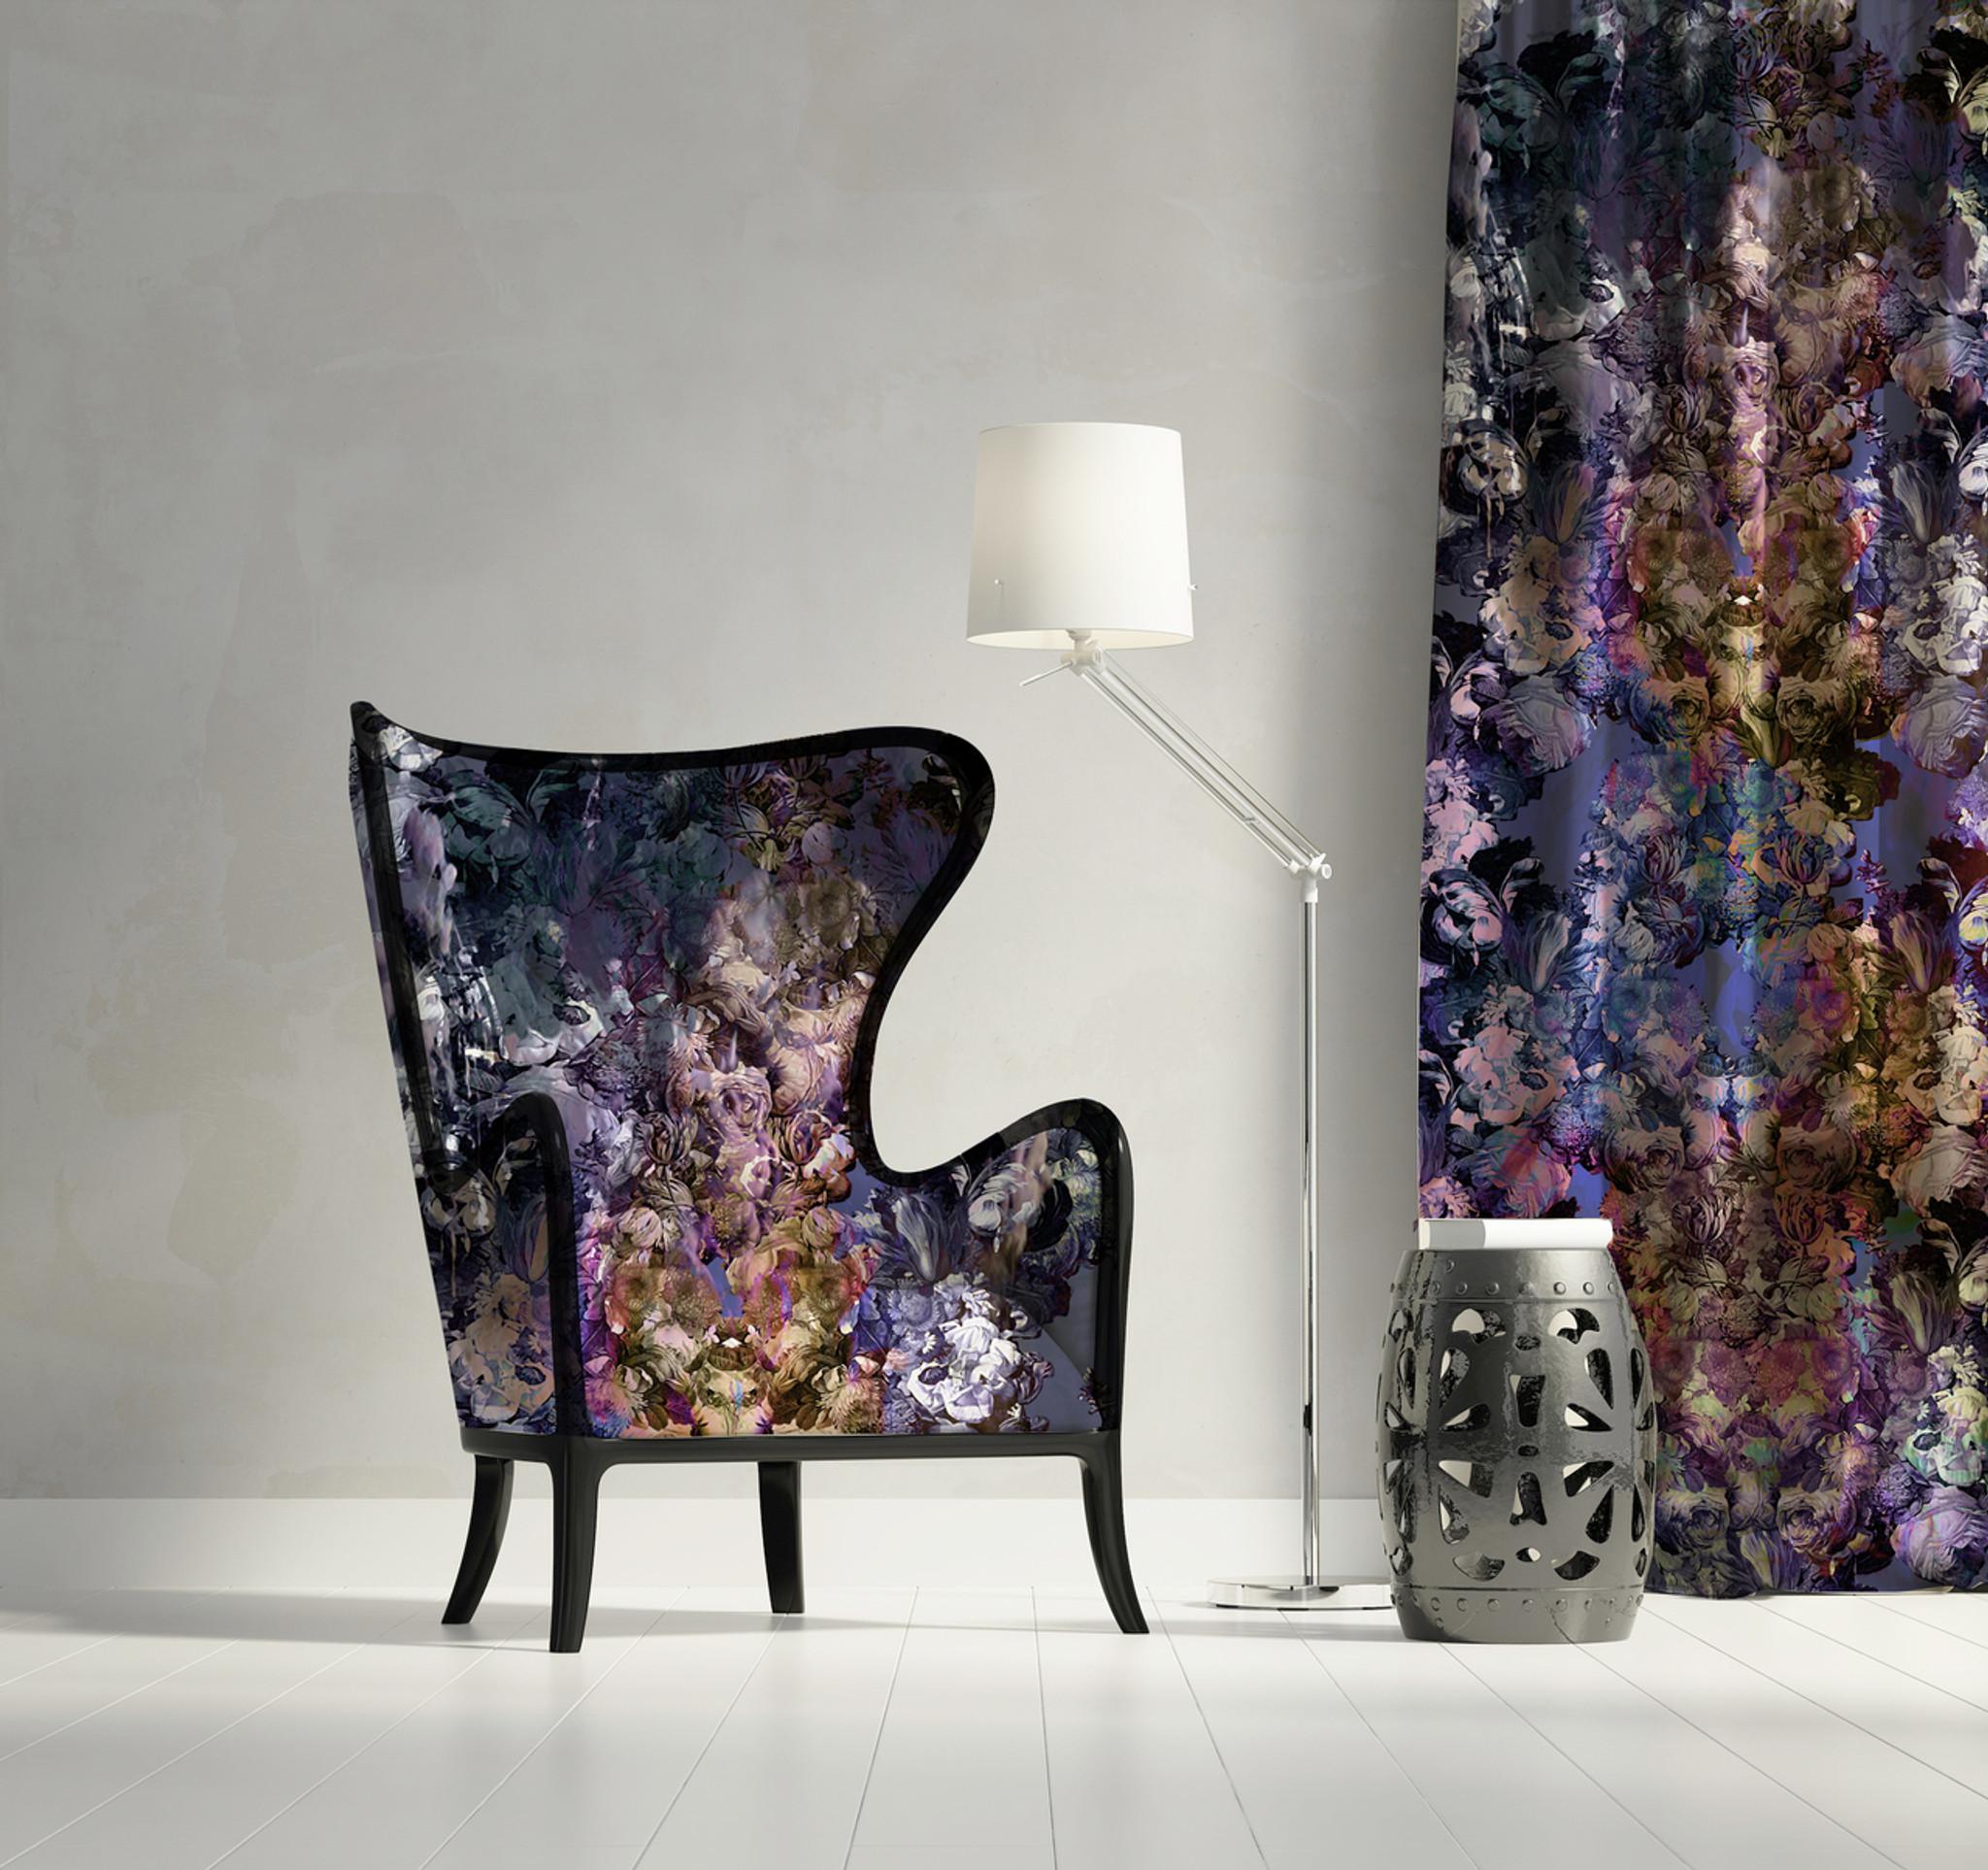 Fabric - Let's Come to an Arrangement - Less Intense